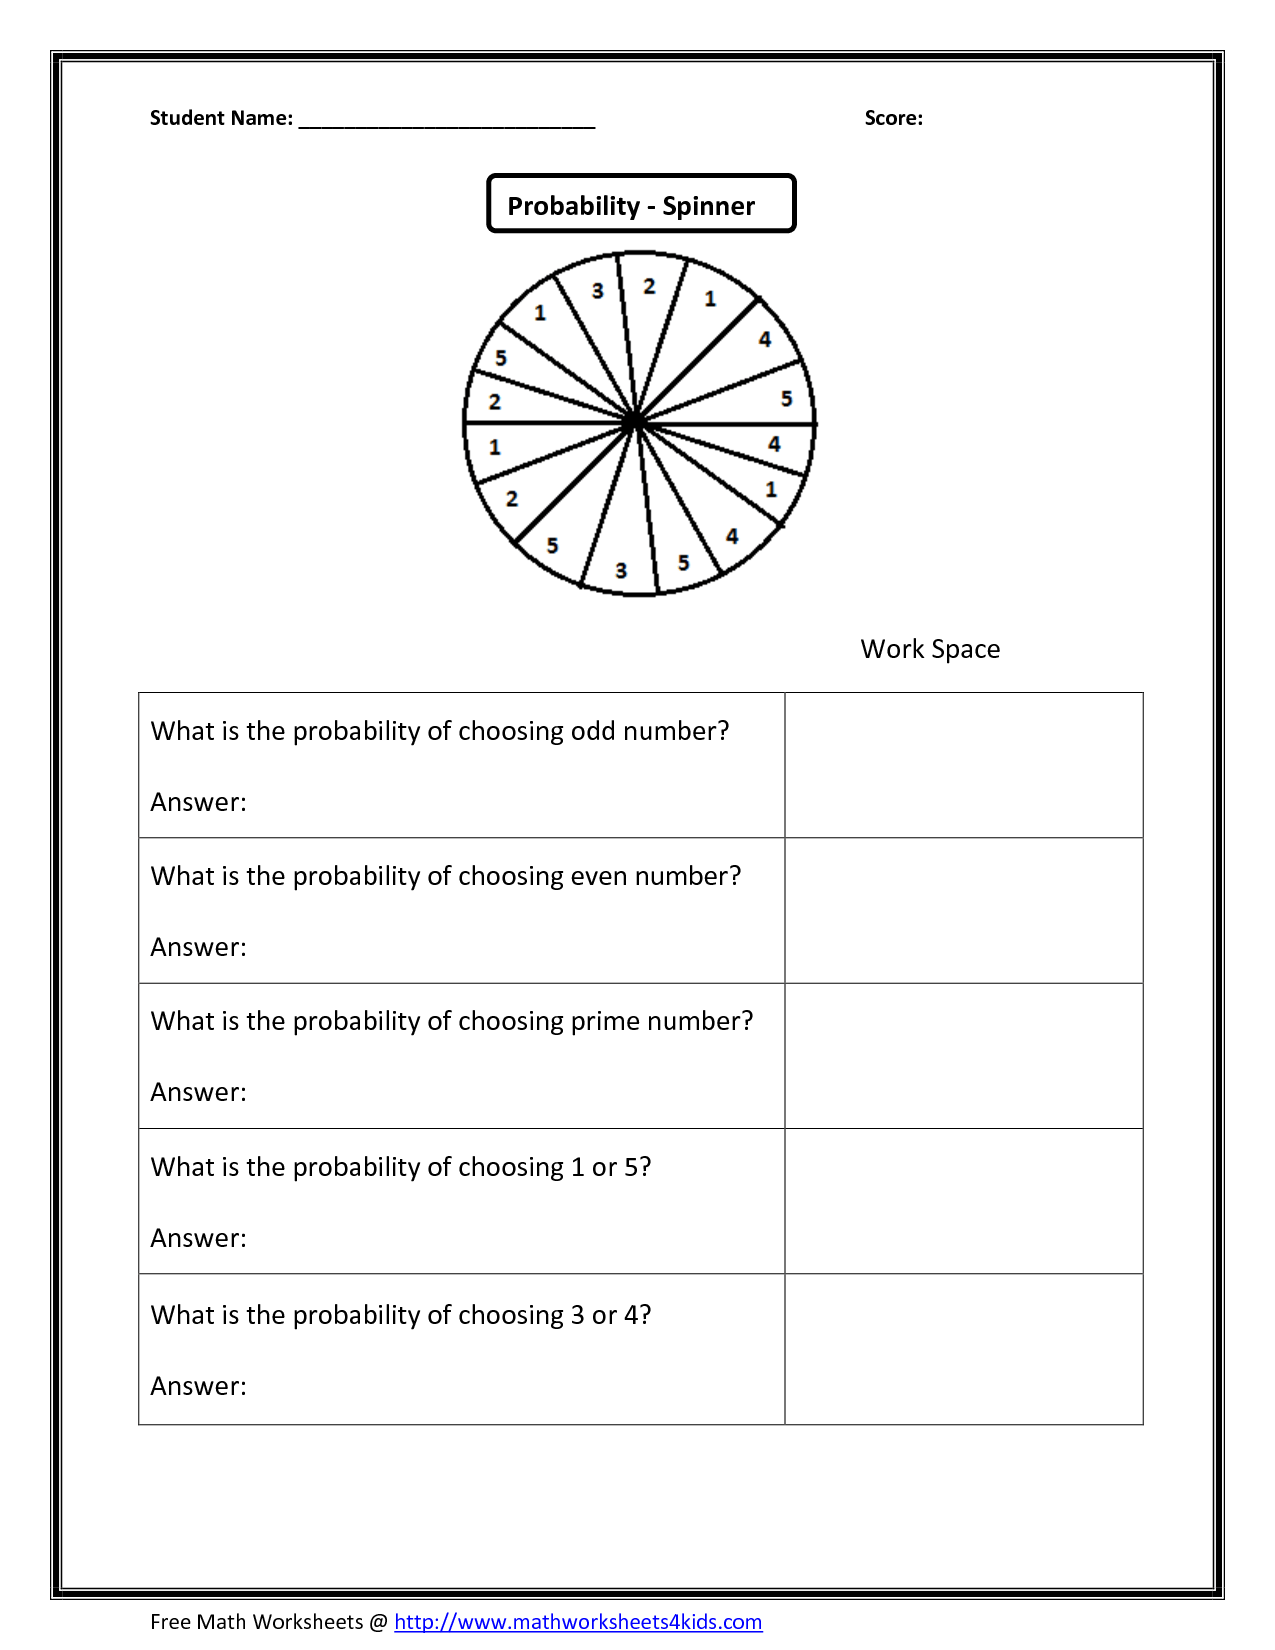 10th Grade Math Worksheet Problems